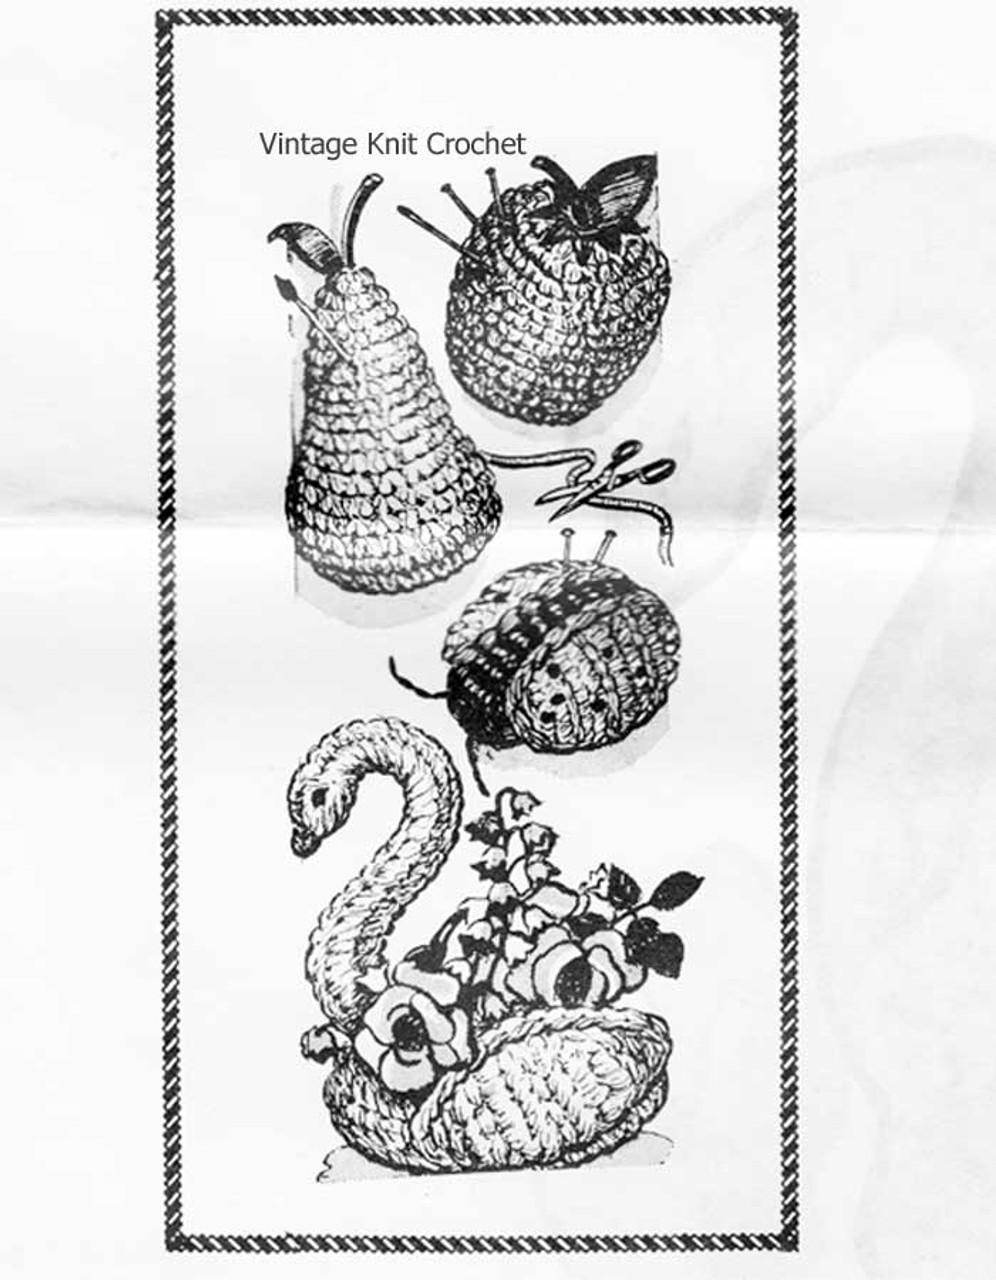 Pear Apple Ladybug Swan crochet pincushions pattern, Laura Wheeler 996